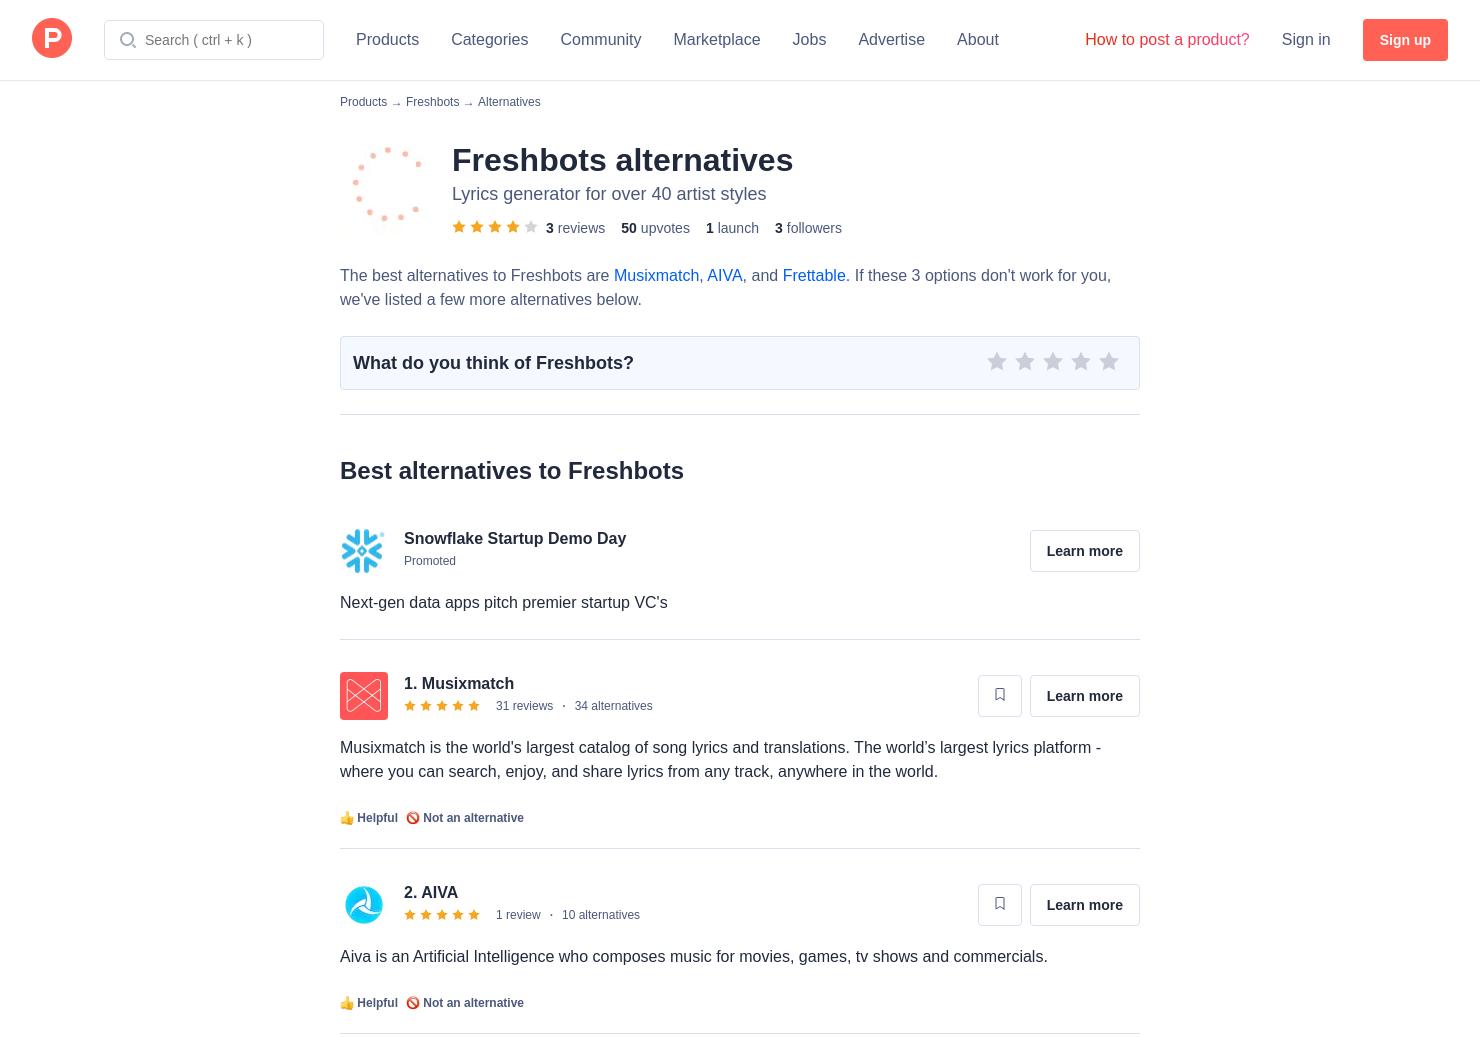 5 Alternatives to Freshbots | Product Hunt